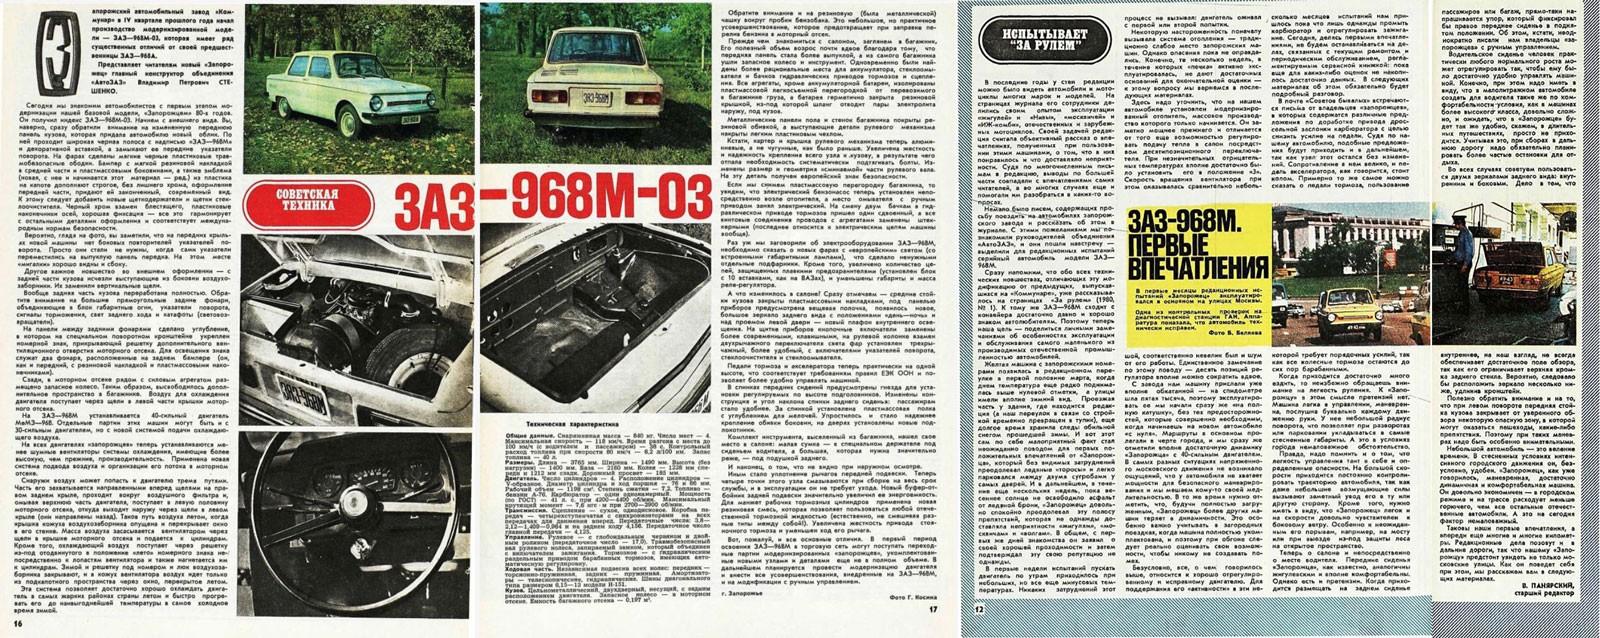 ZR-1980-1